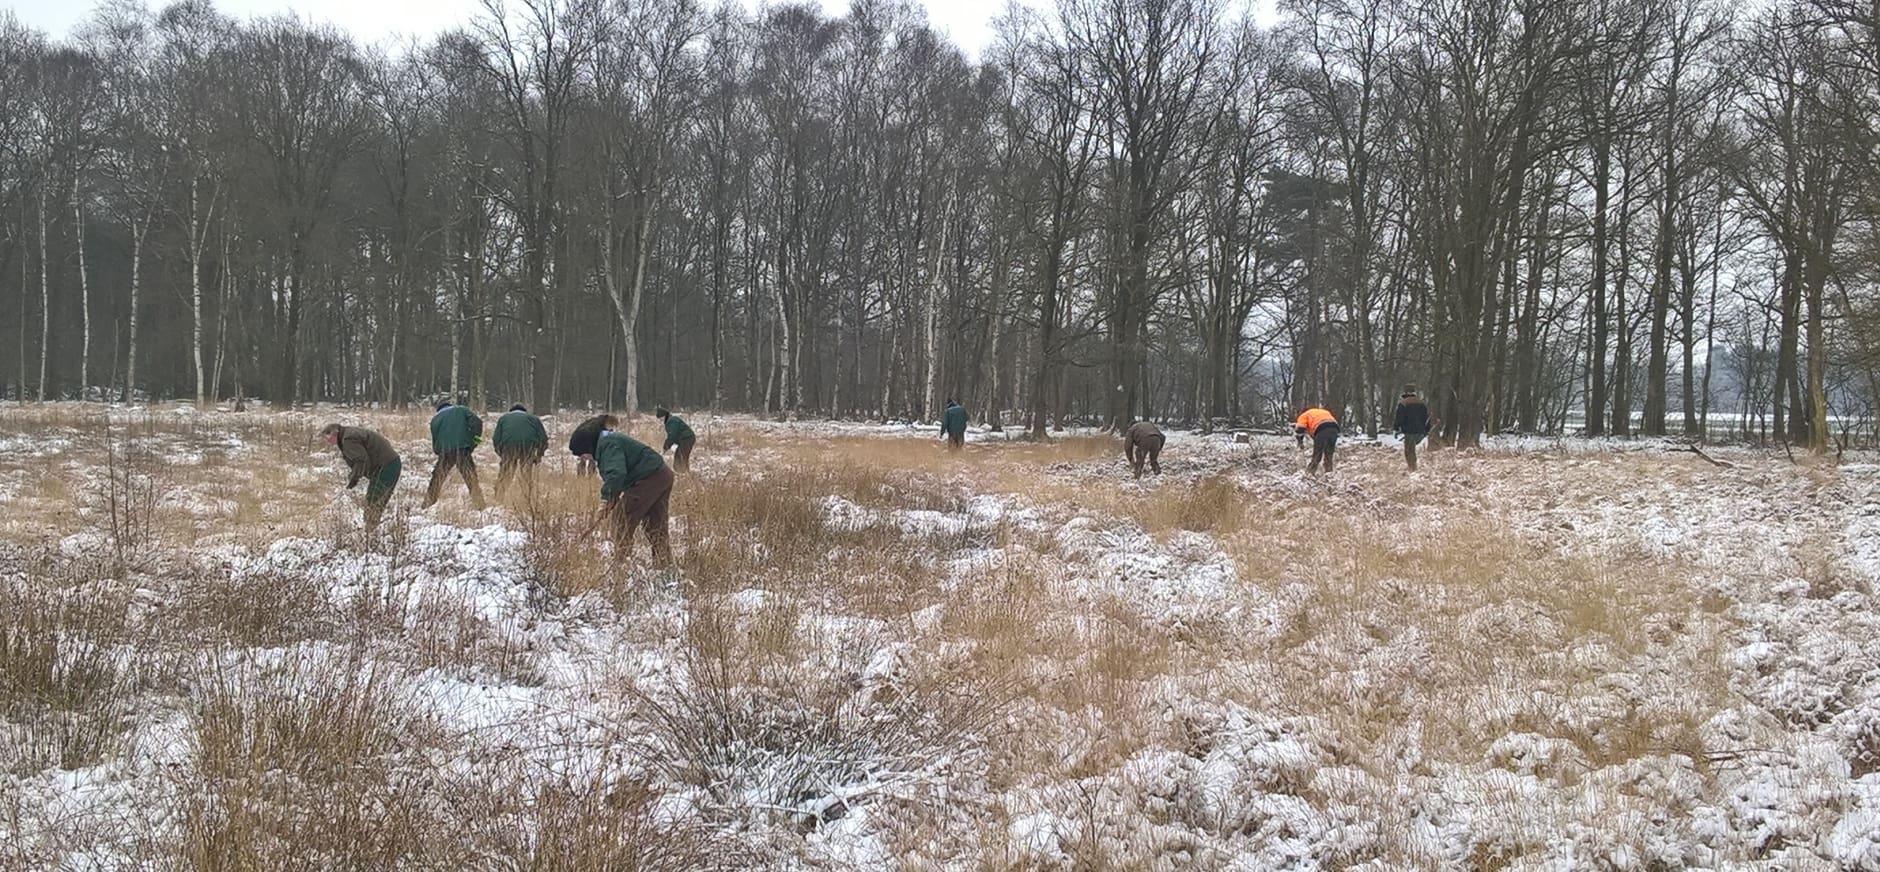 Jonge boompjes weghalen om veenmos alle ruimte te geven